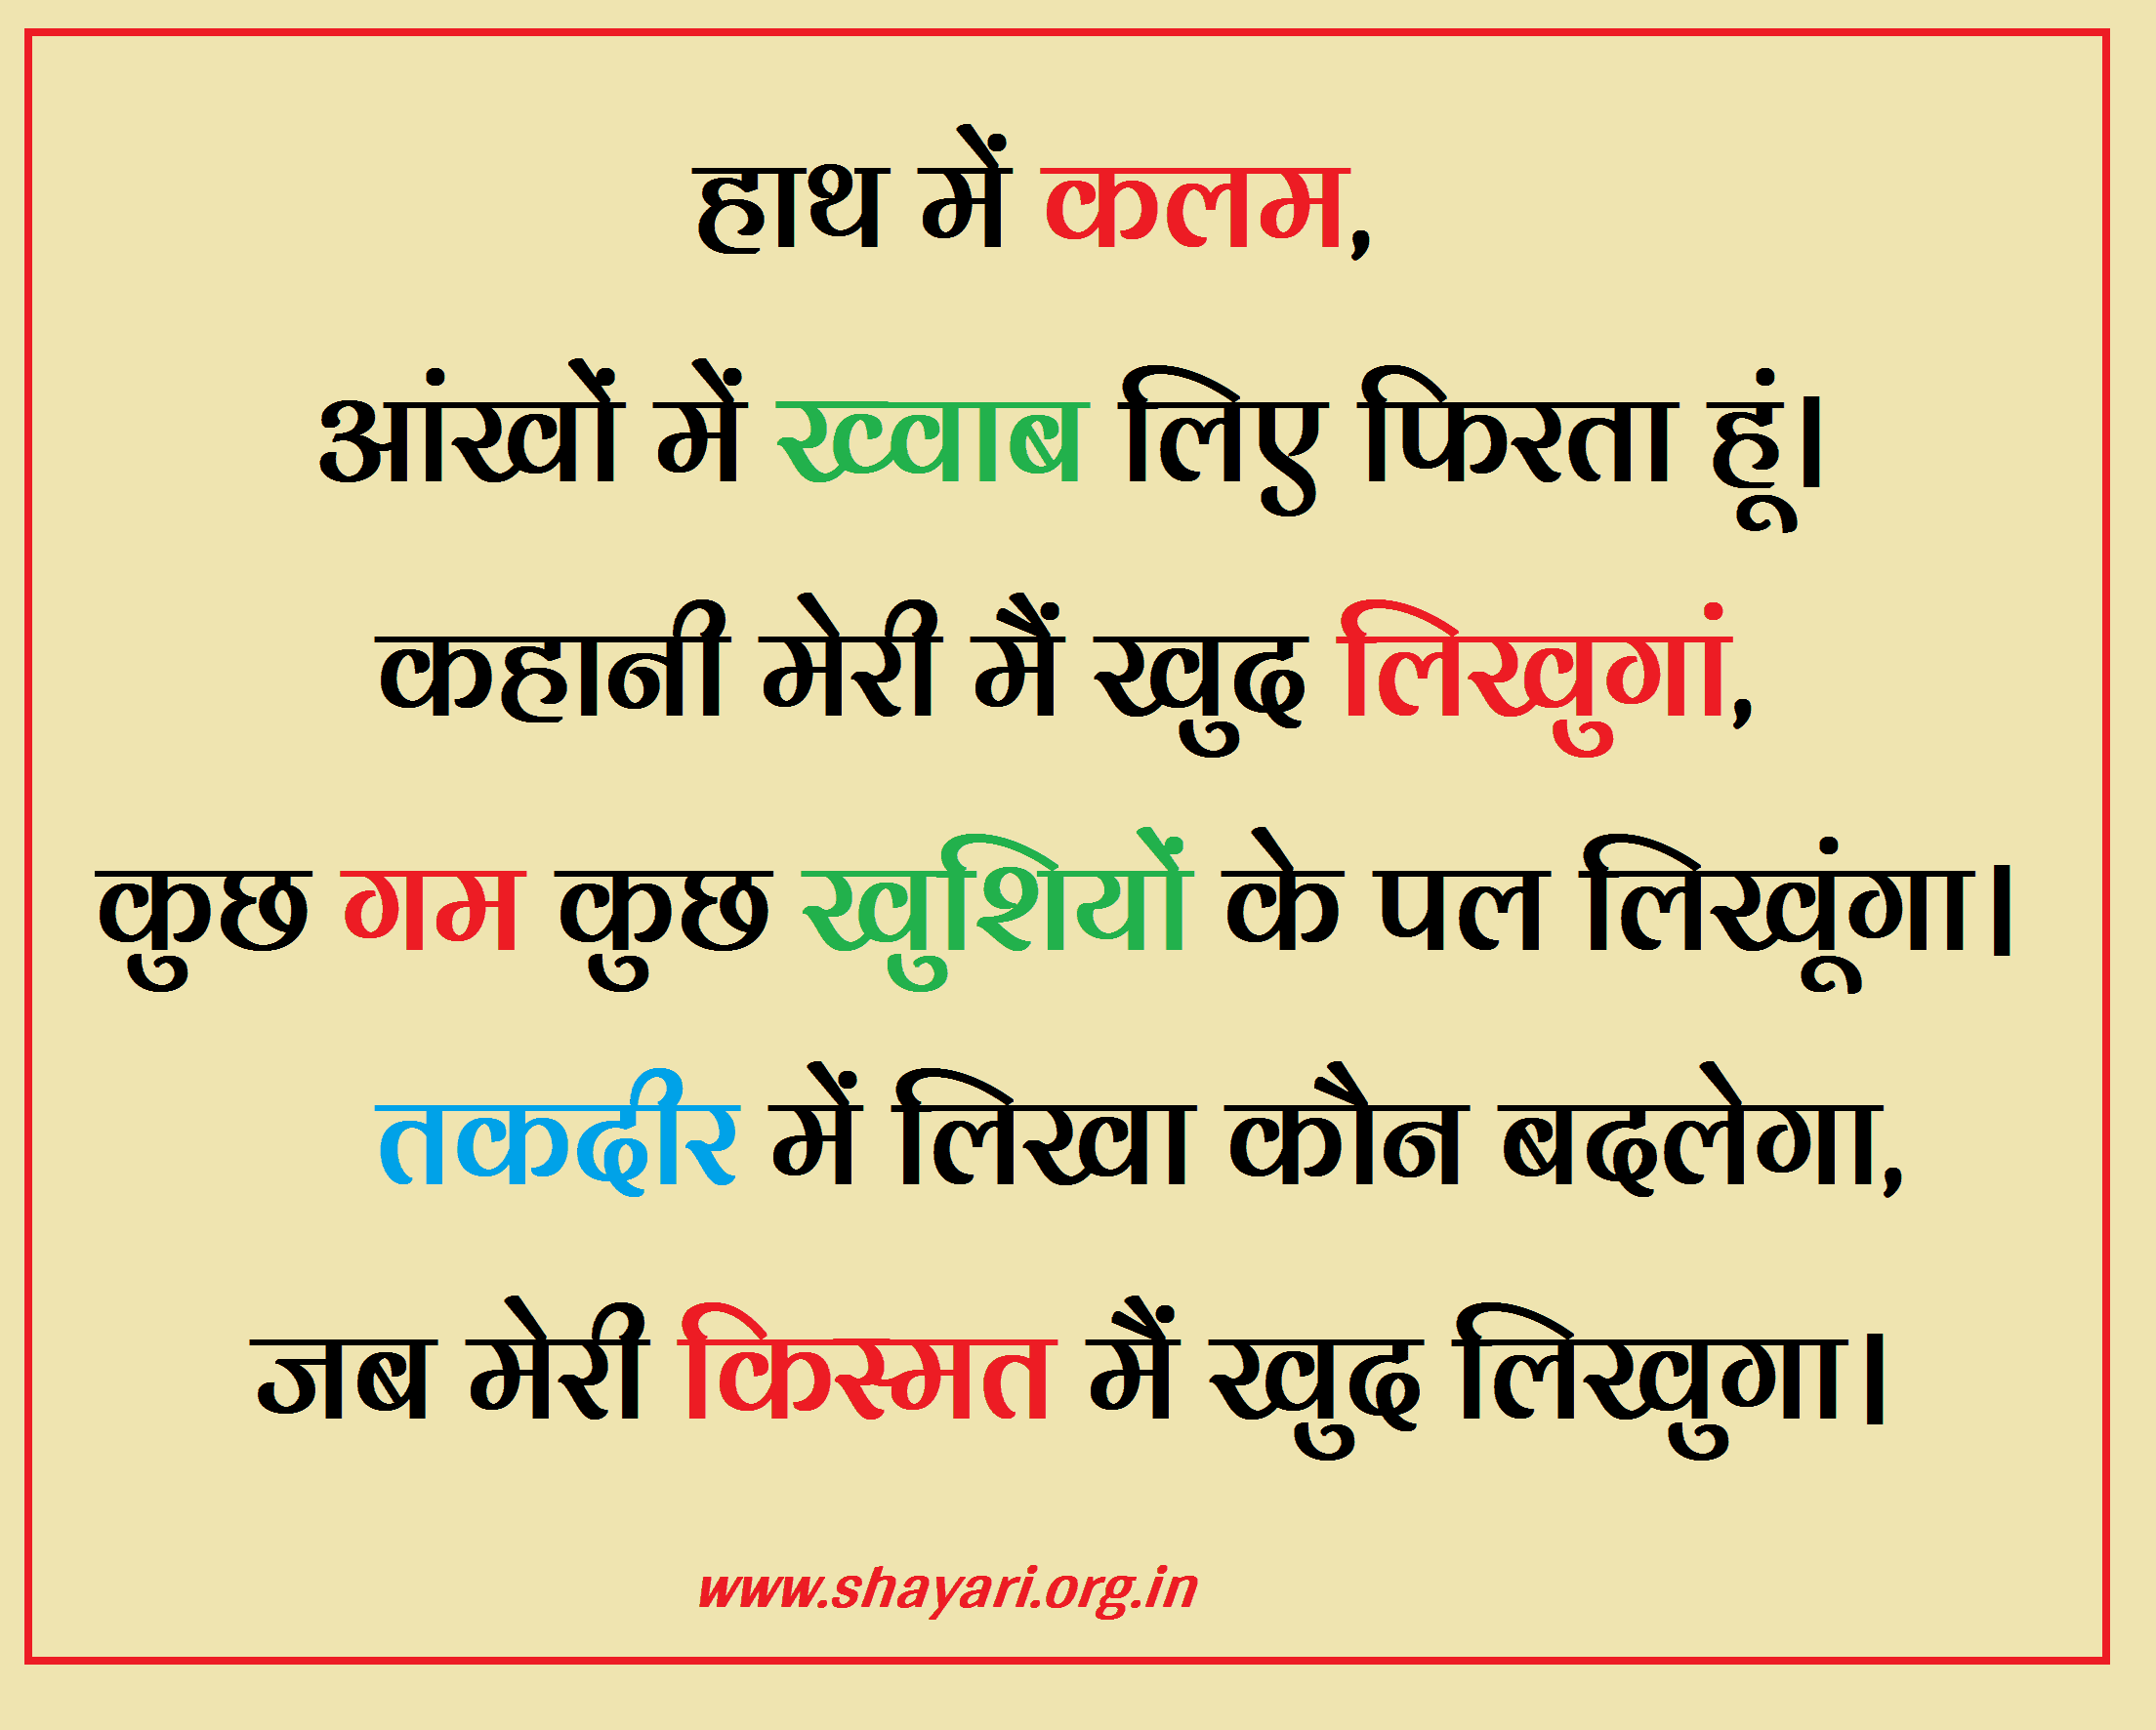 Meri Kismat me Khud Likhunga (मेरी किस्मत में खुद लिखूंगा) Hindi Shayari 2020